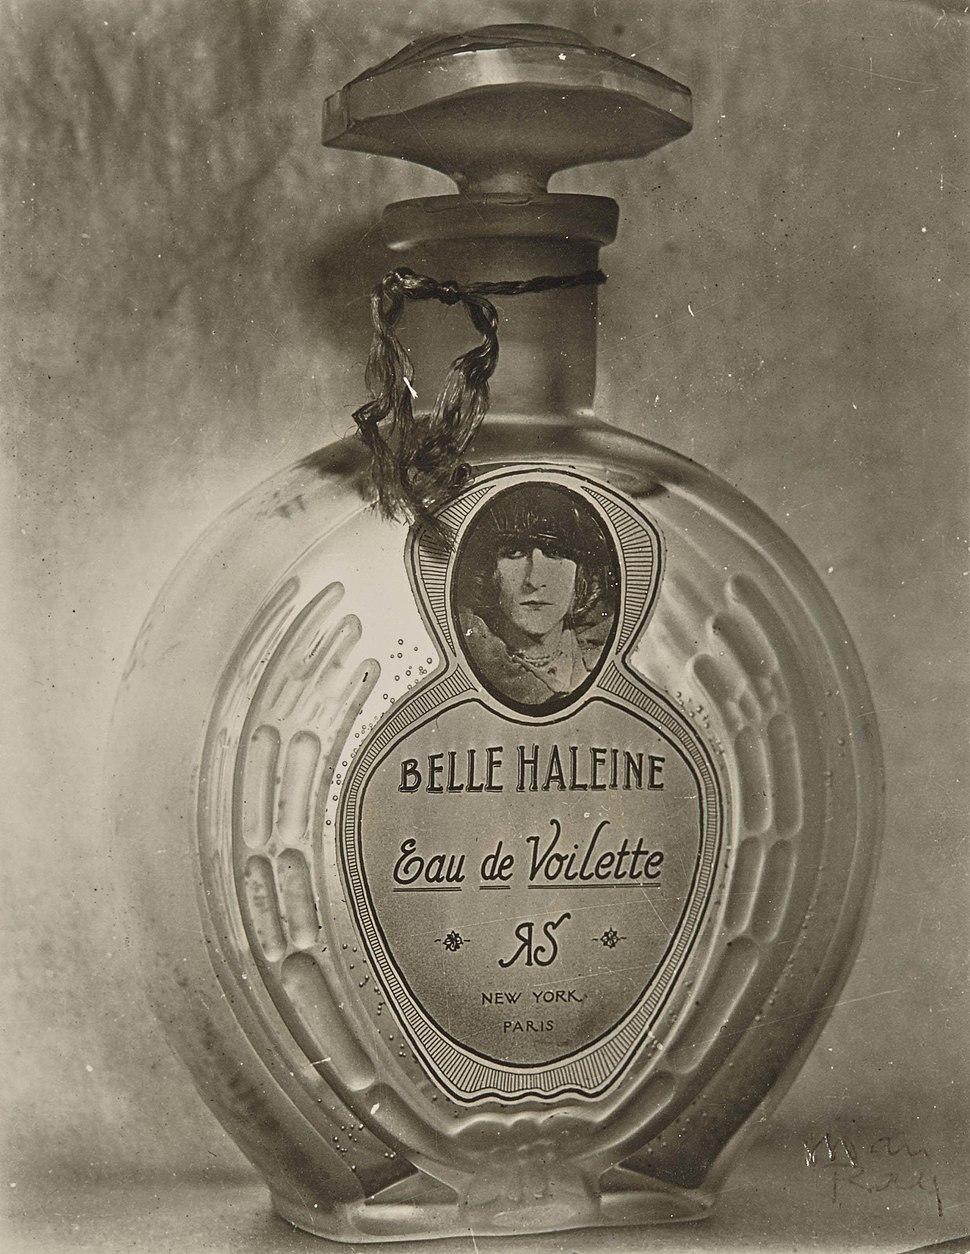 Marcel Duchamp (Rrose Selavy), Man Ray, 1920-21, Belle Haleine, Eau de Voilette